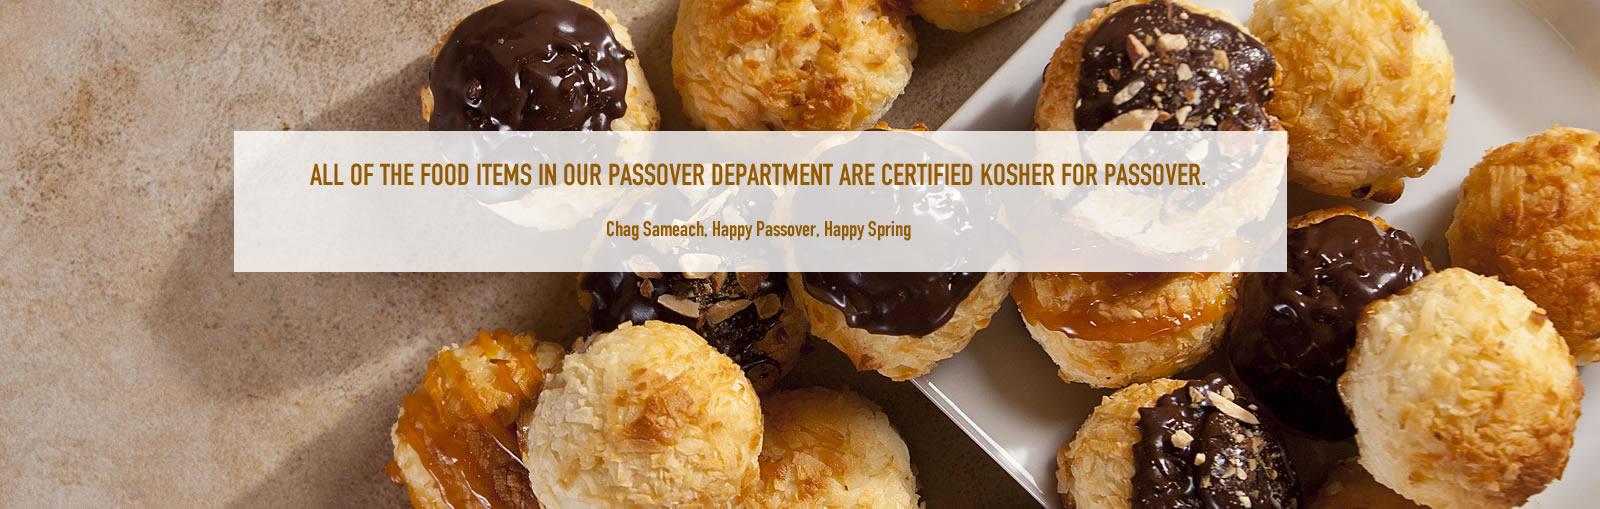 passover-gifts-desserts2.jpg